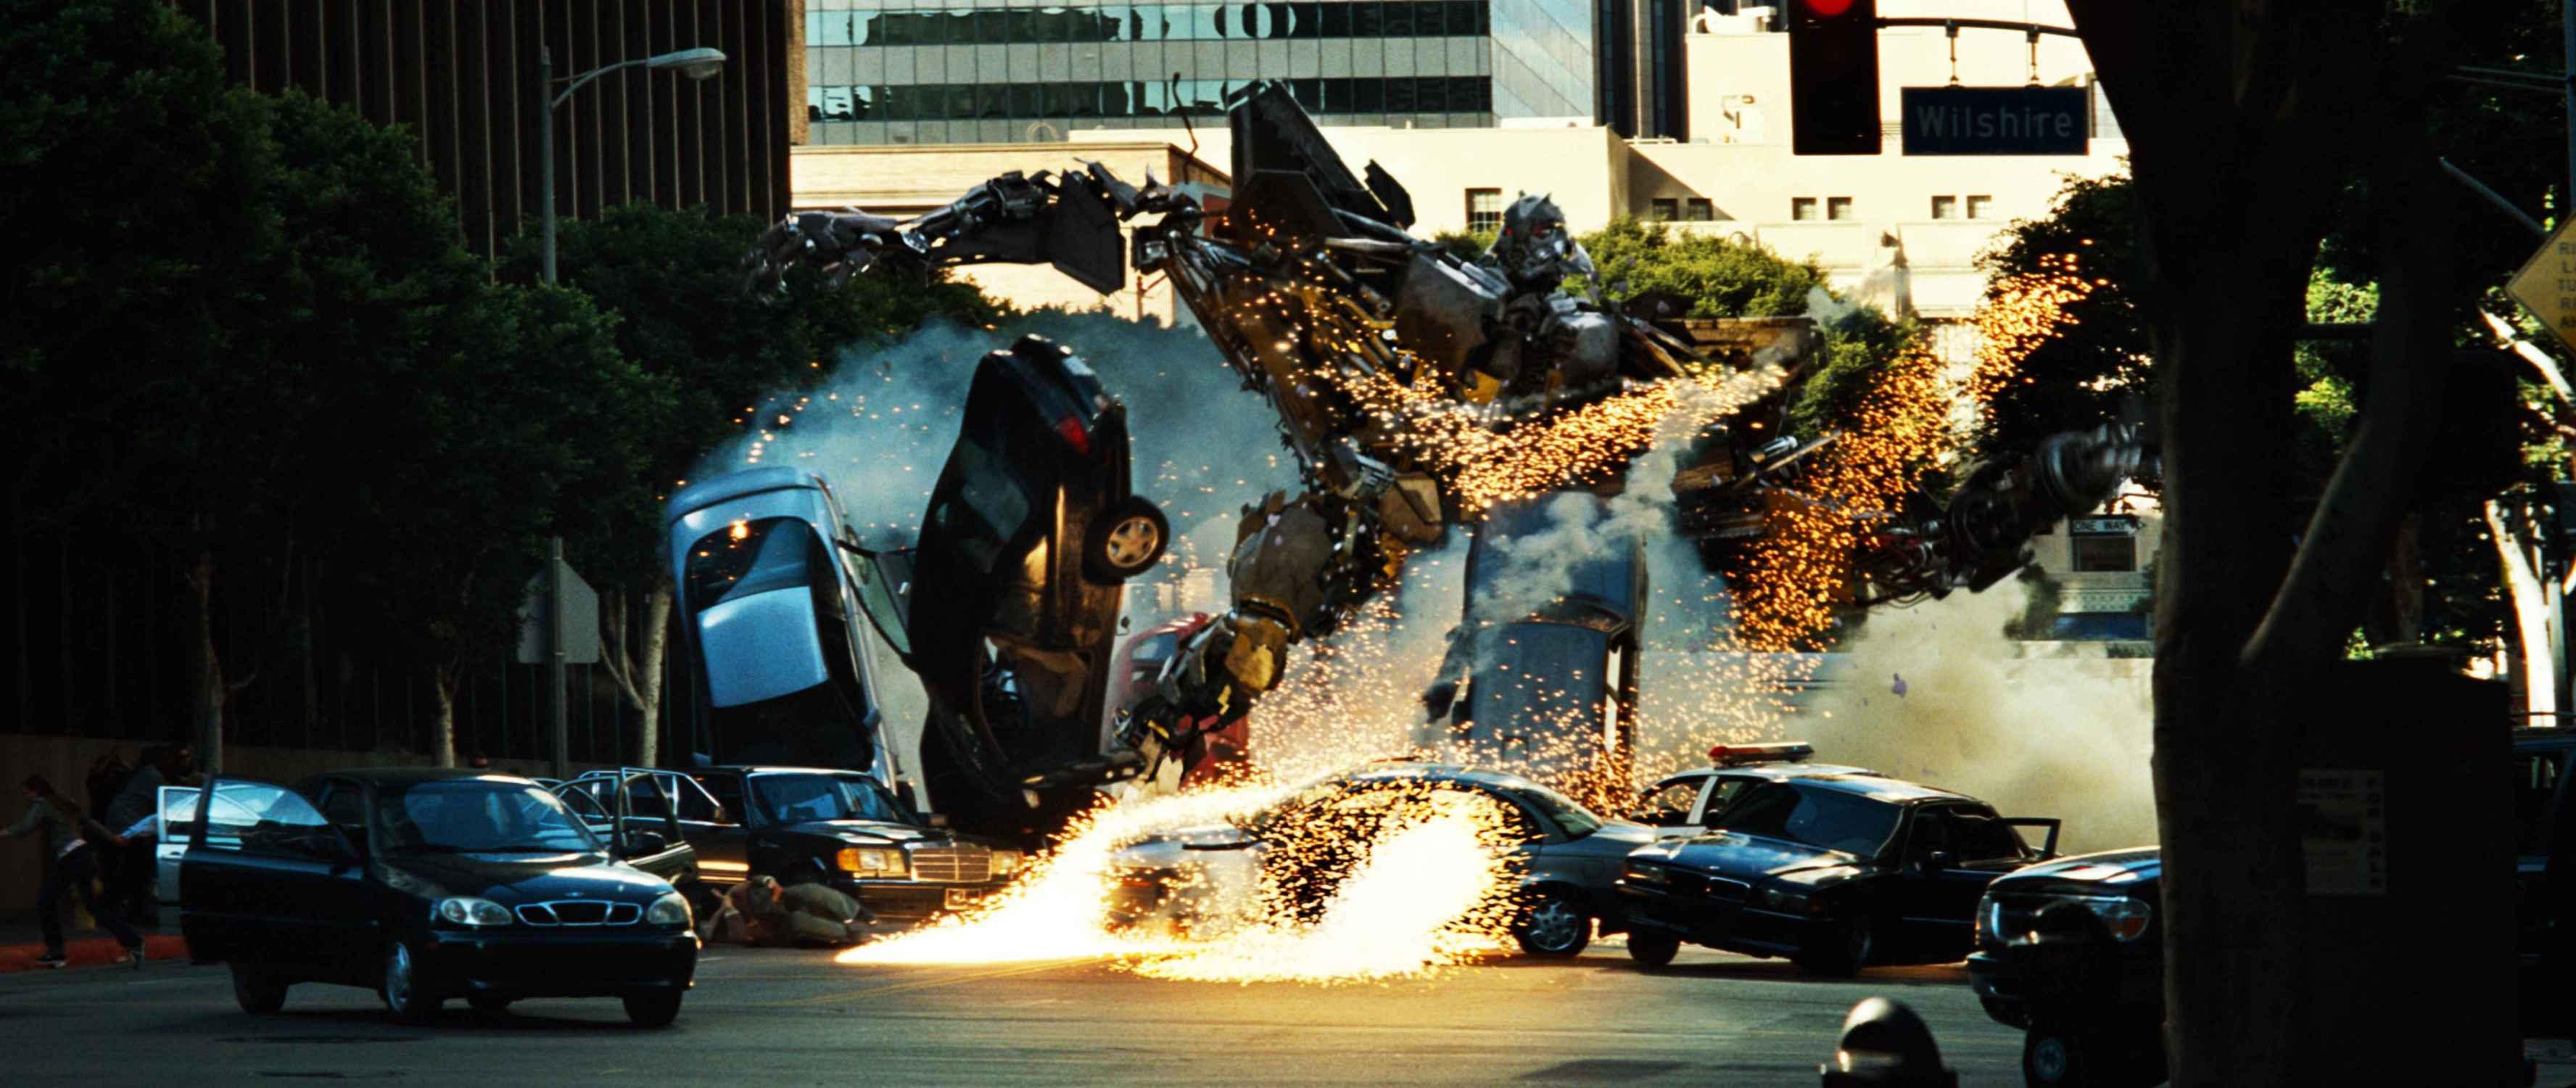 WTF: Transformers (2007) – 1,2,3 WTF!? (Watch the Film) Transformers 2007